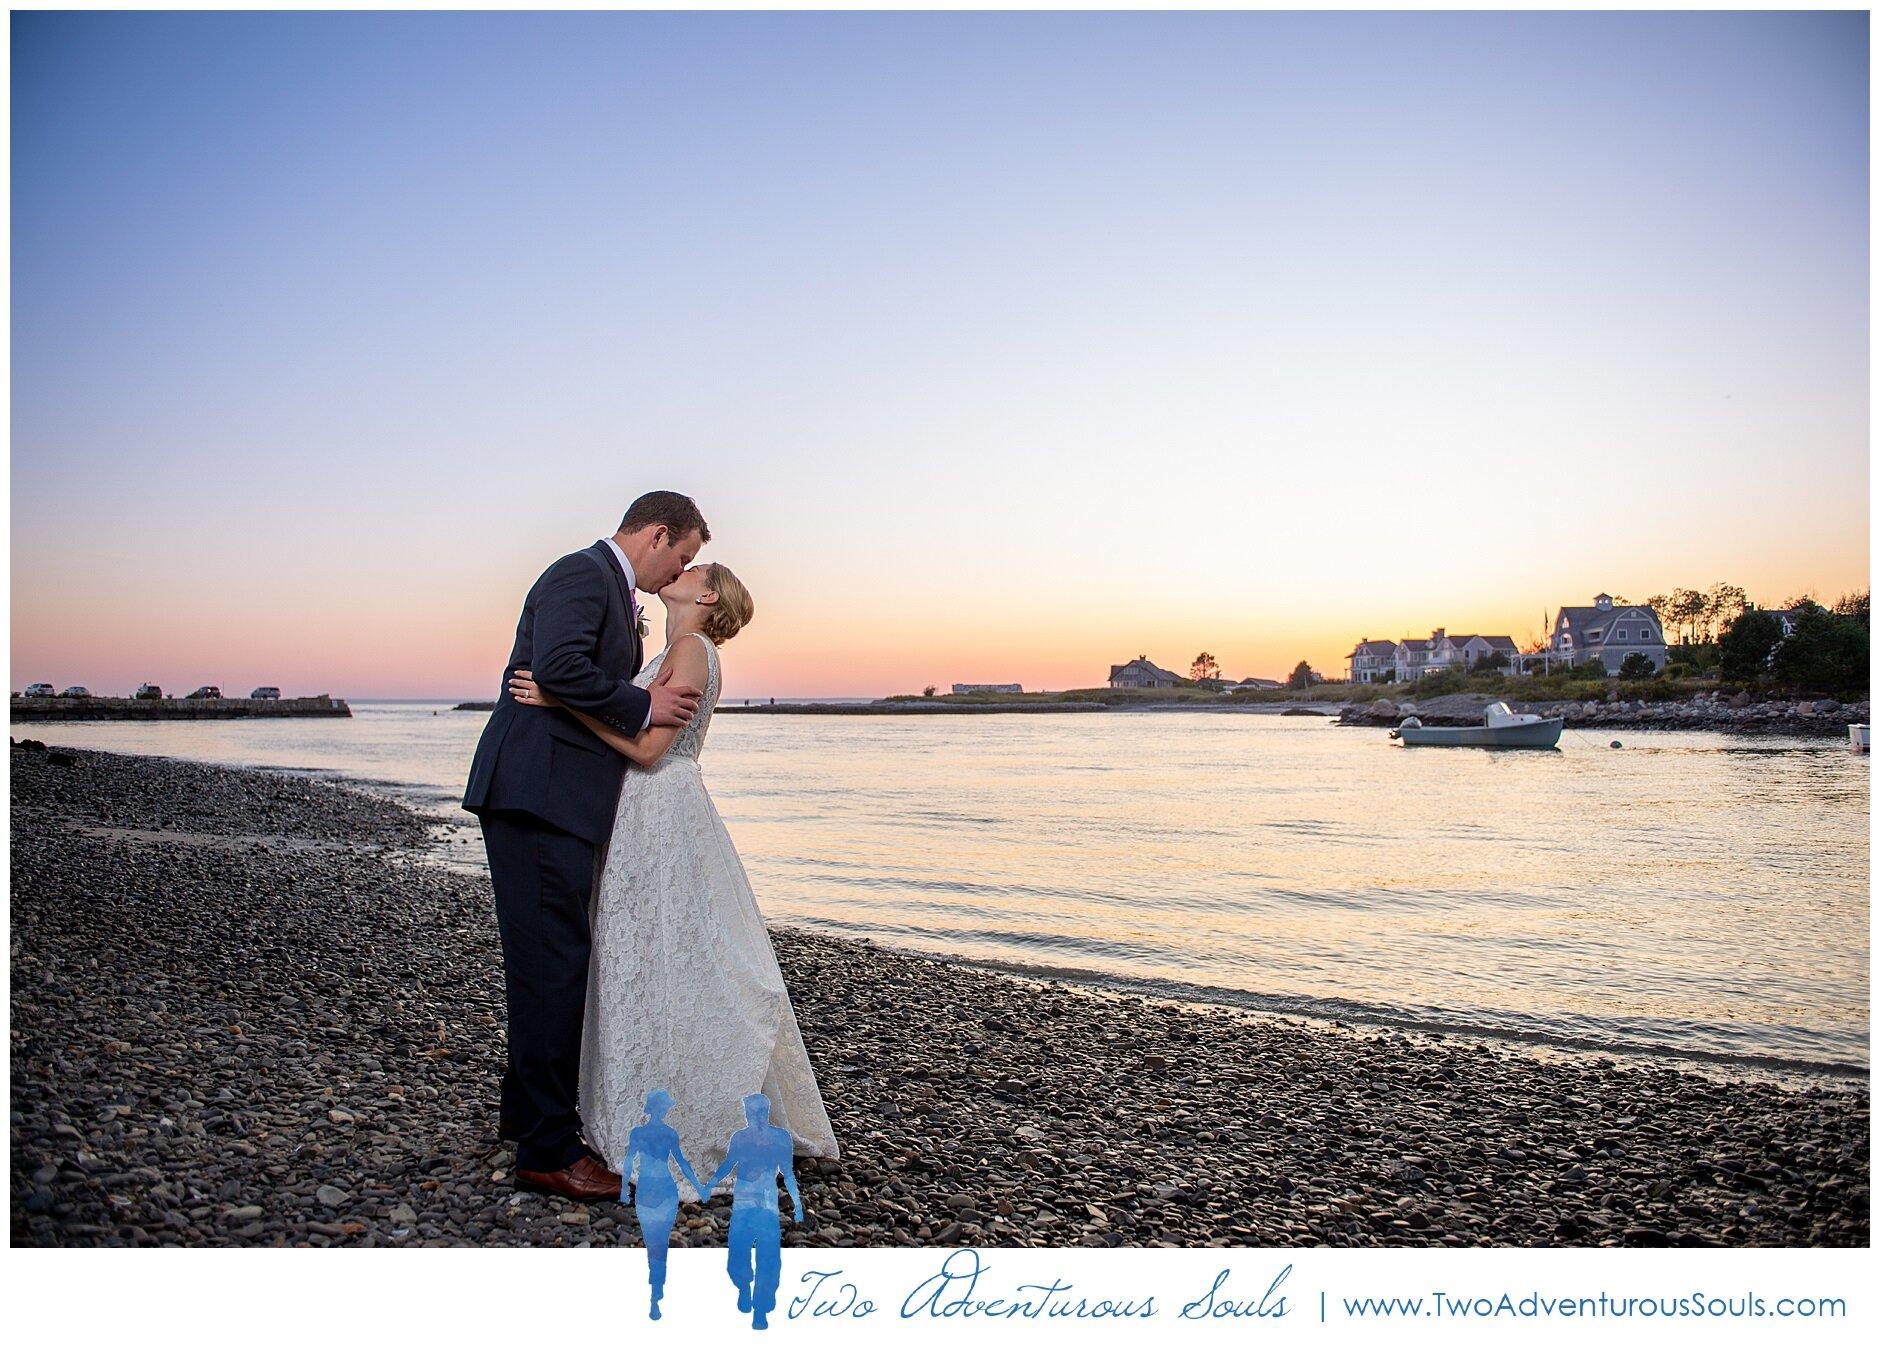 Breakwater Inn and Spa Wedding Photographers, Kennebunkport Wedding Photographers, Two Adventurous Souls- 092119_0052.jpg